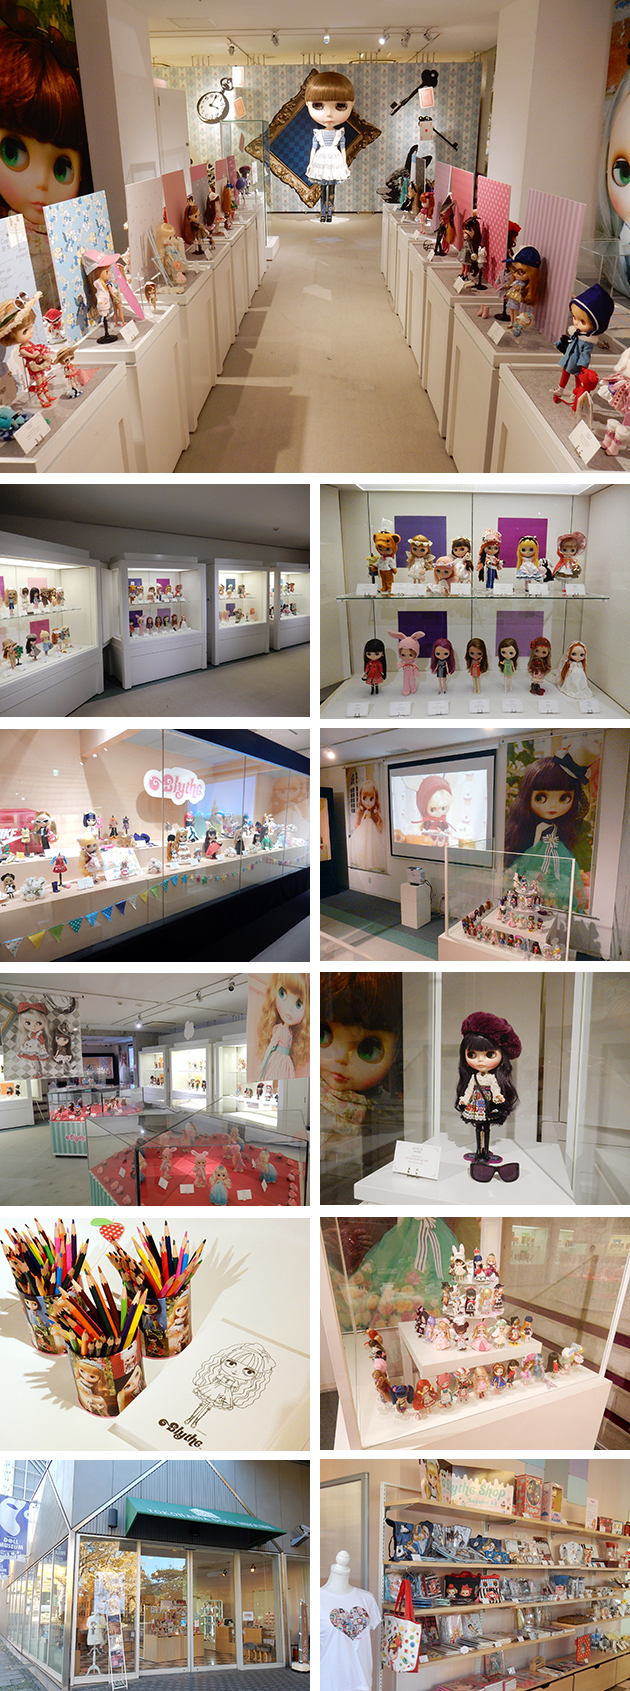 20161203_yokohamadollmuseum_01